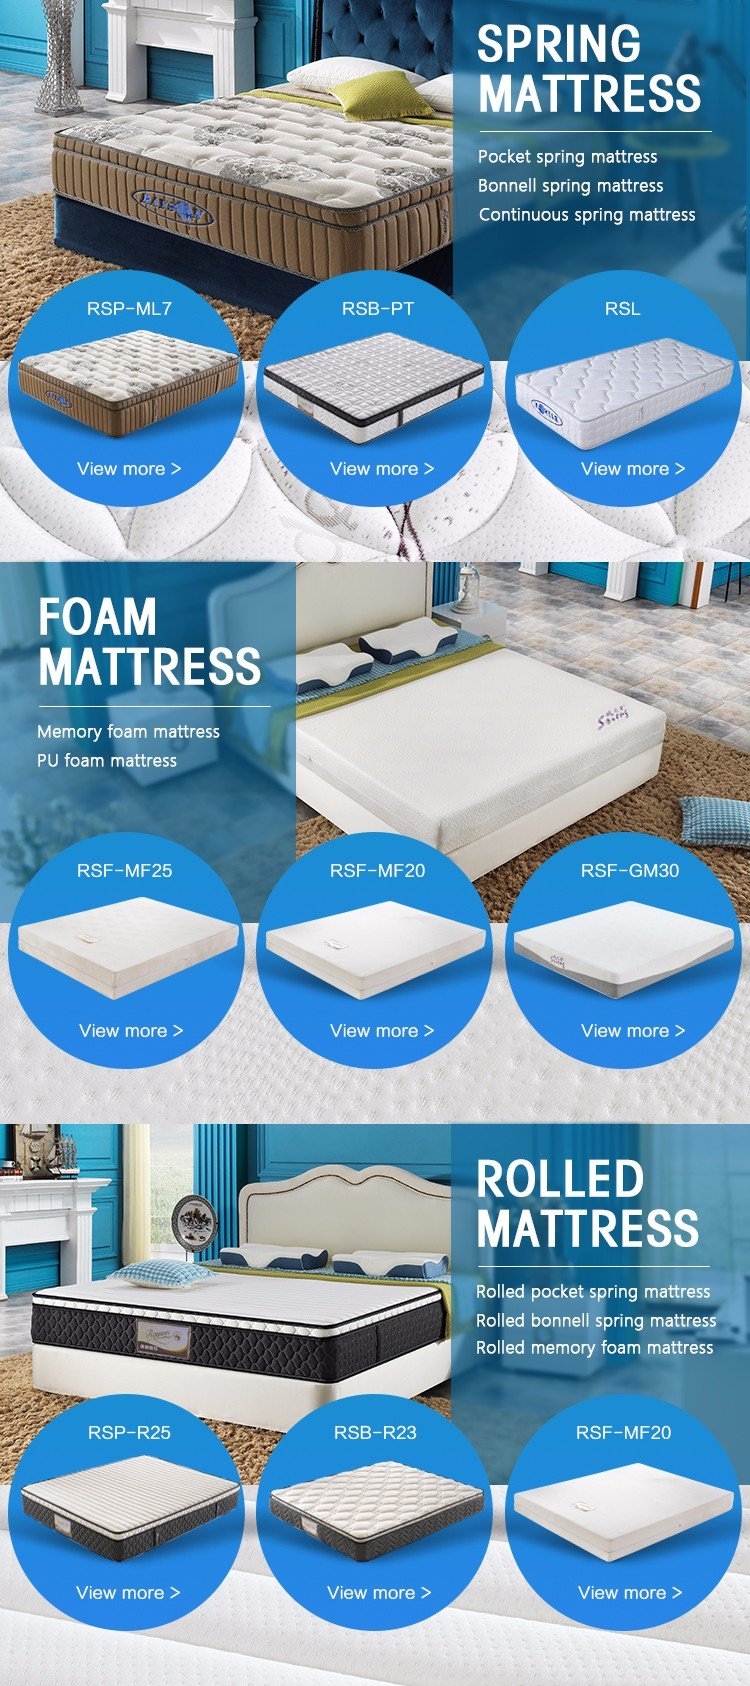 Rayson Mattress rolled vacuum seal memory foam mattress manufacturers-10